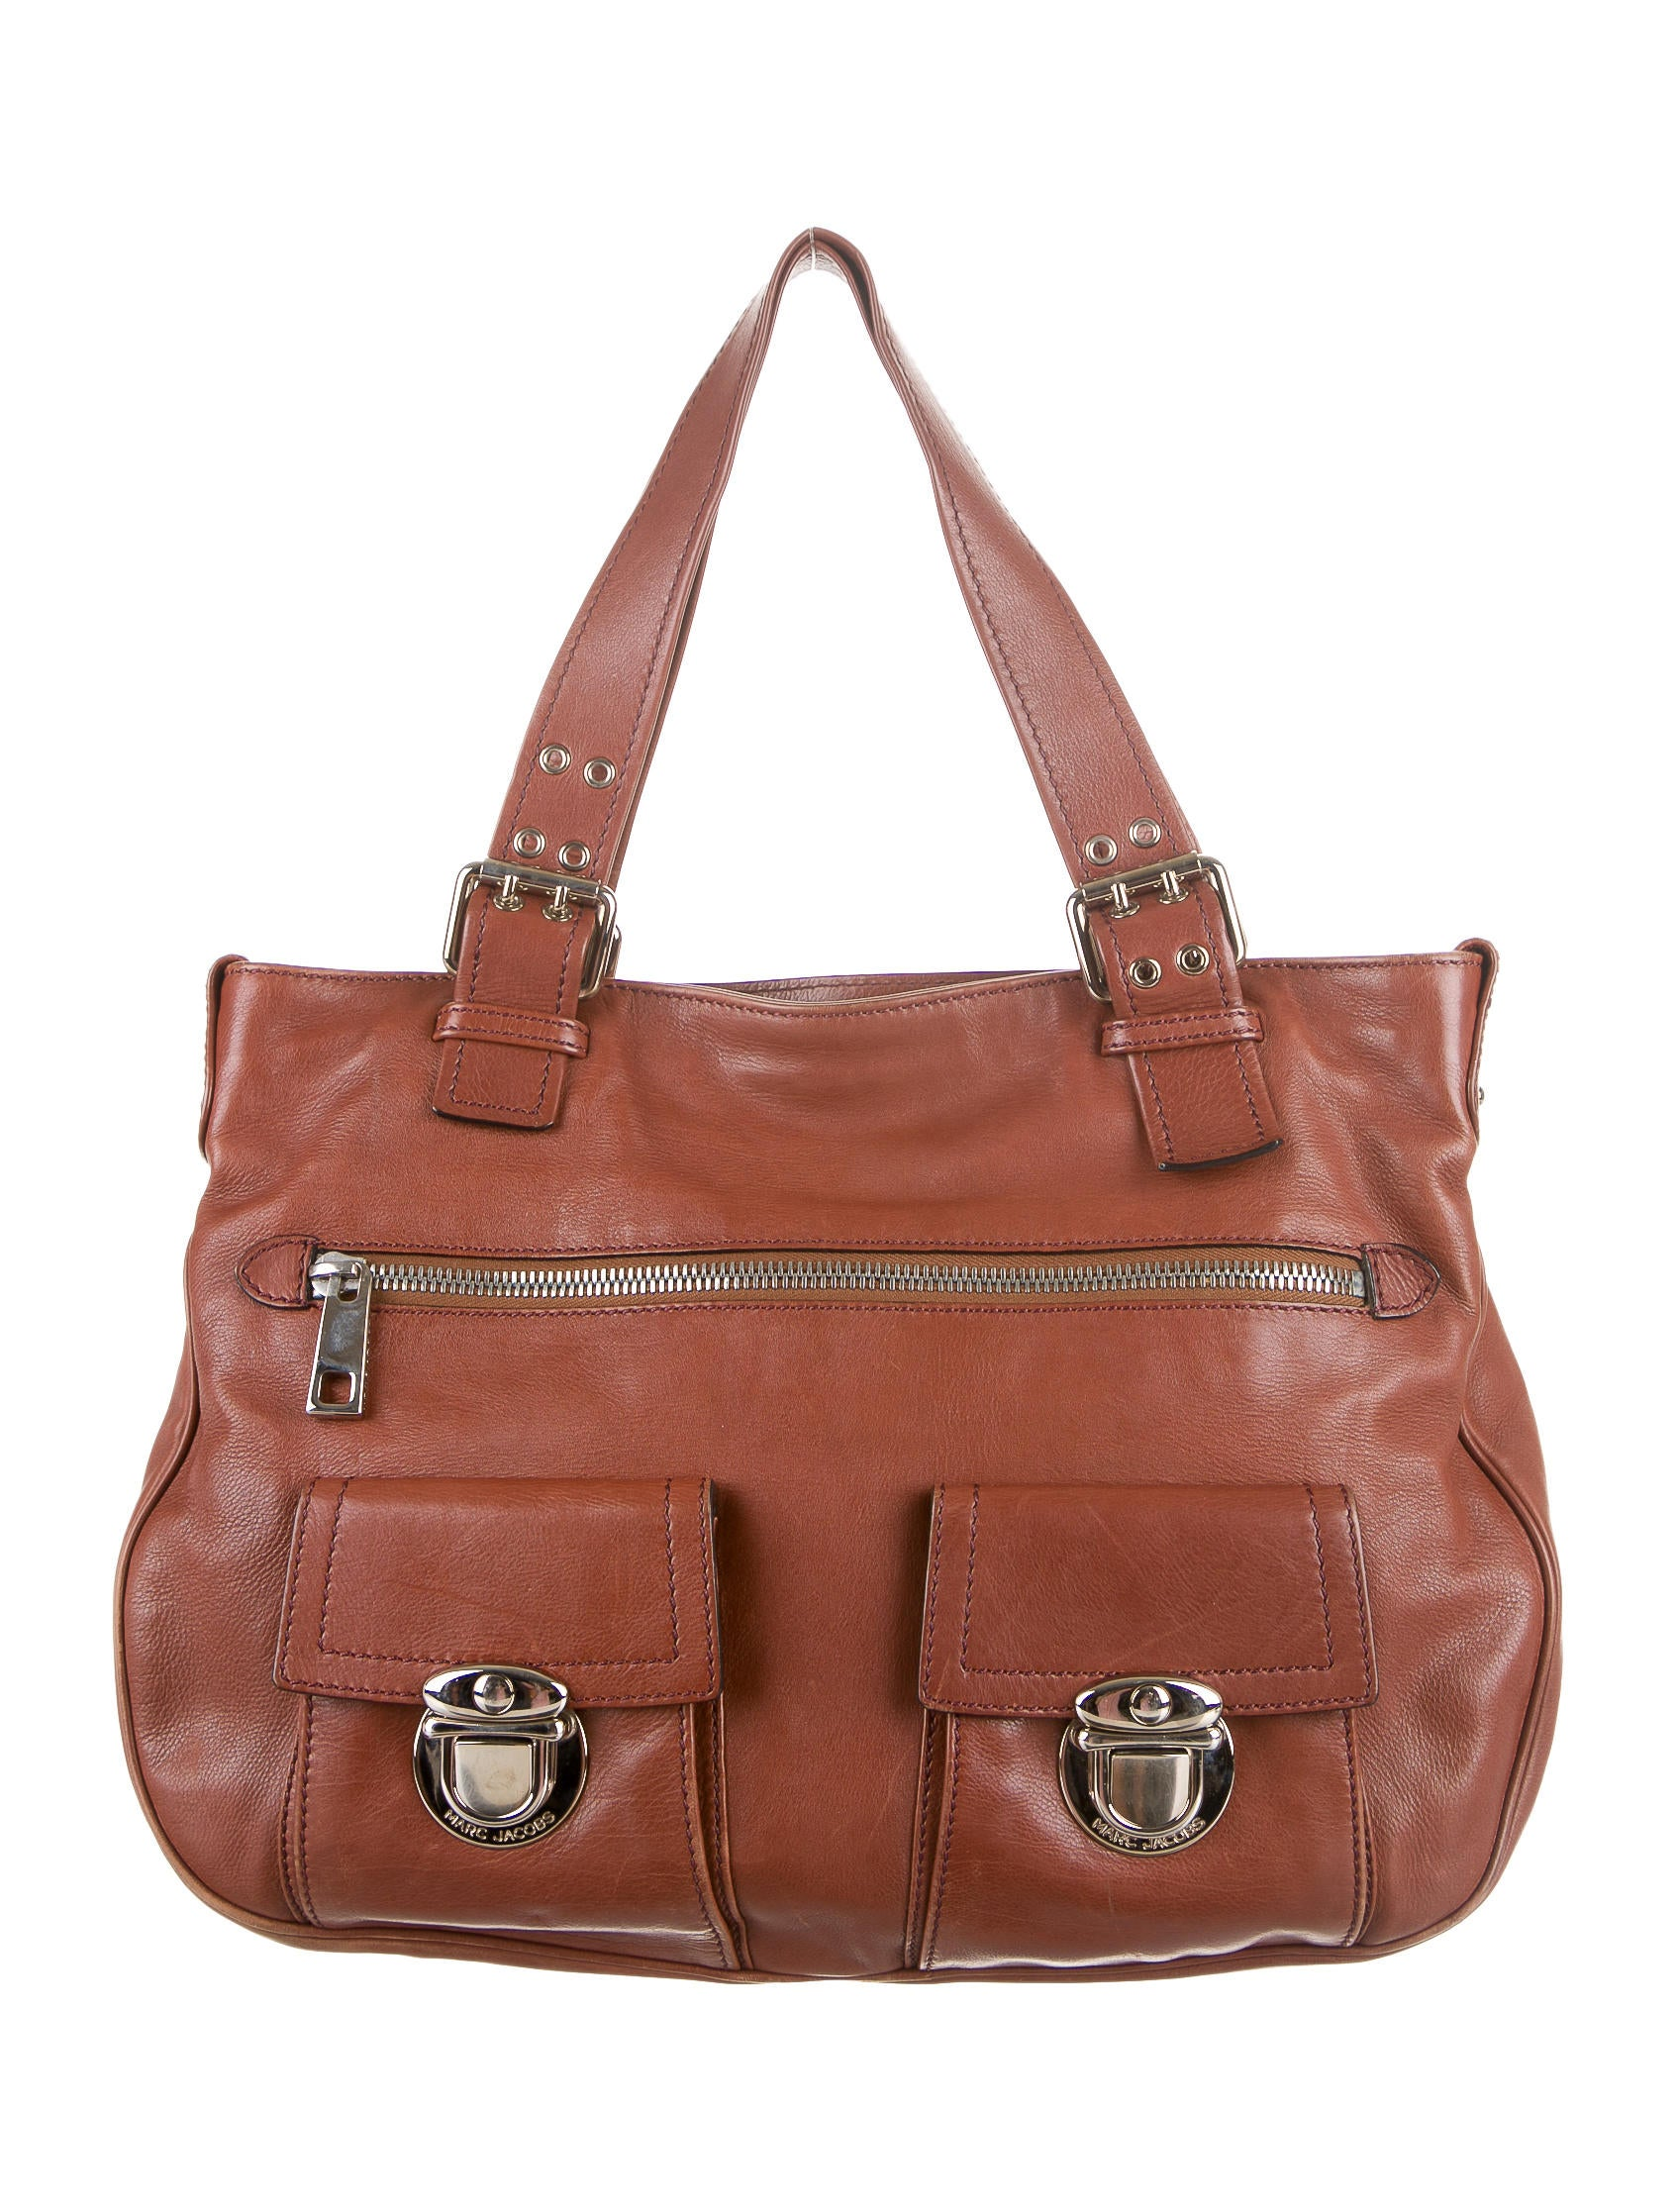 7b6653d143 Marc Jacobs Stella Bag - Handbags - MAR27013 | The RealReal